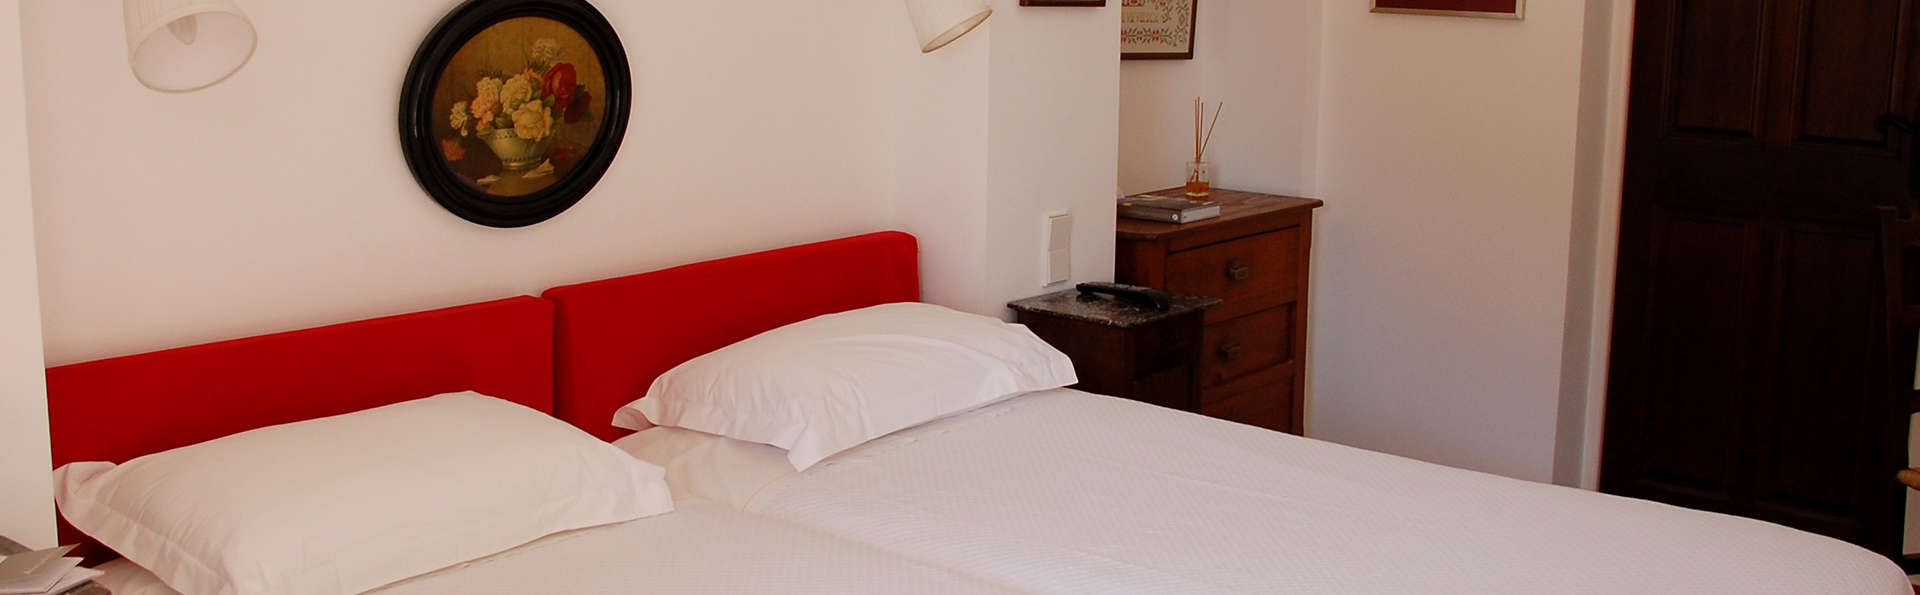 La Ferme d'Augustin - Edit_Room8.jpg